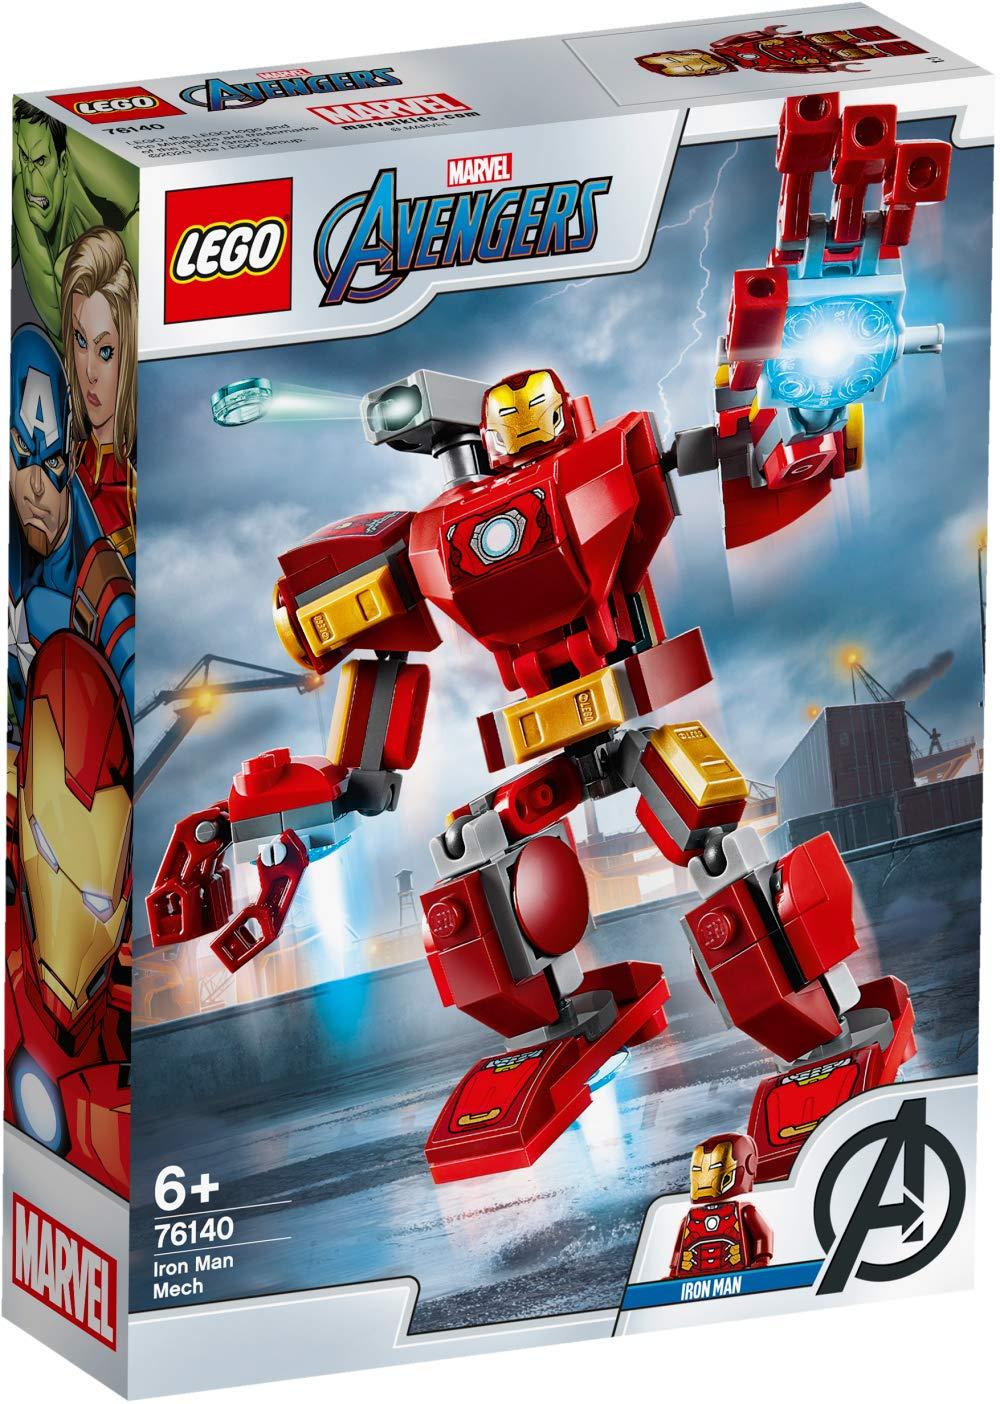 LEGO 76140 MECH IRON MAN 76140 LEGO S.P.A.